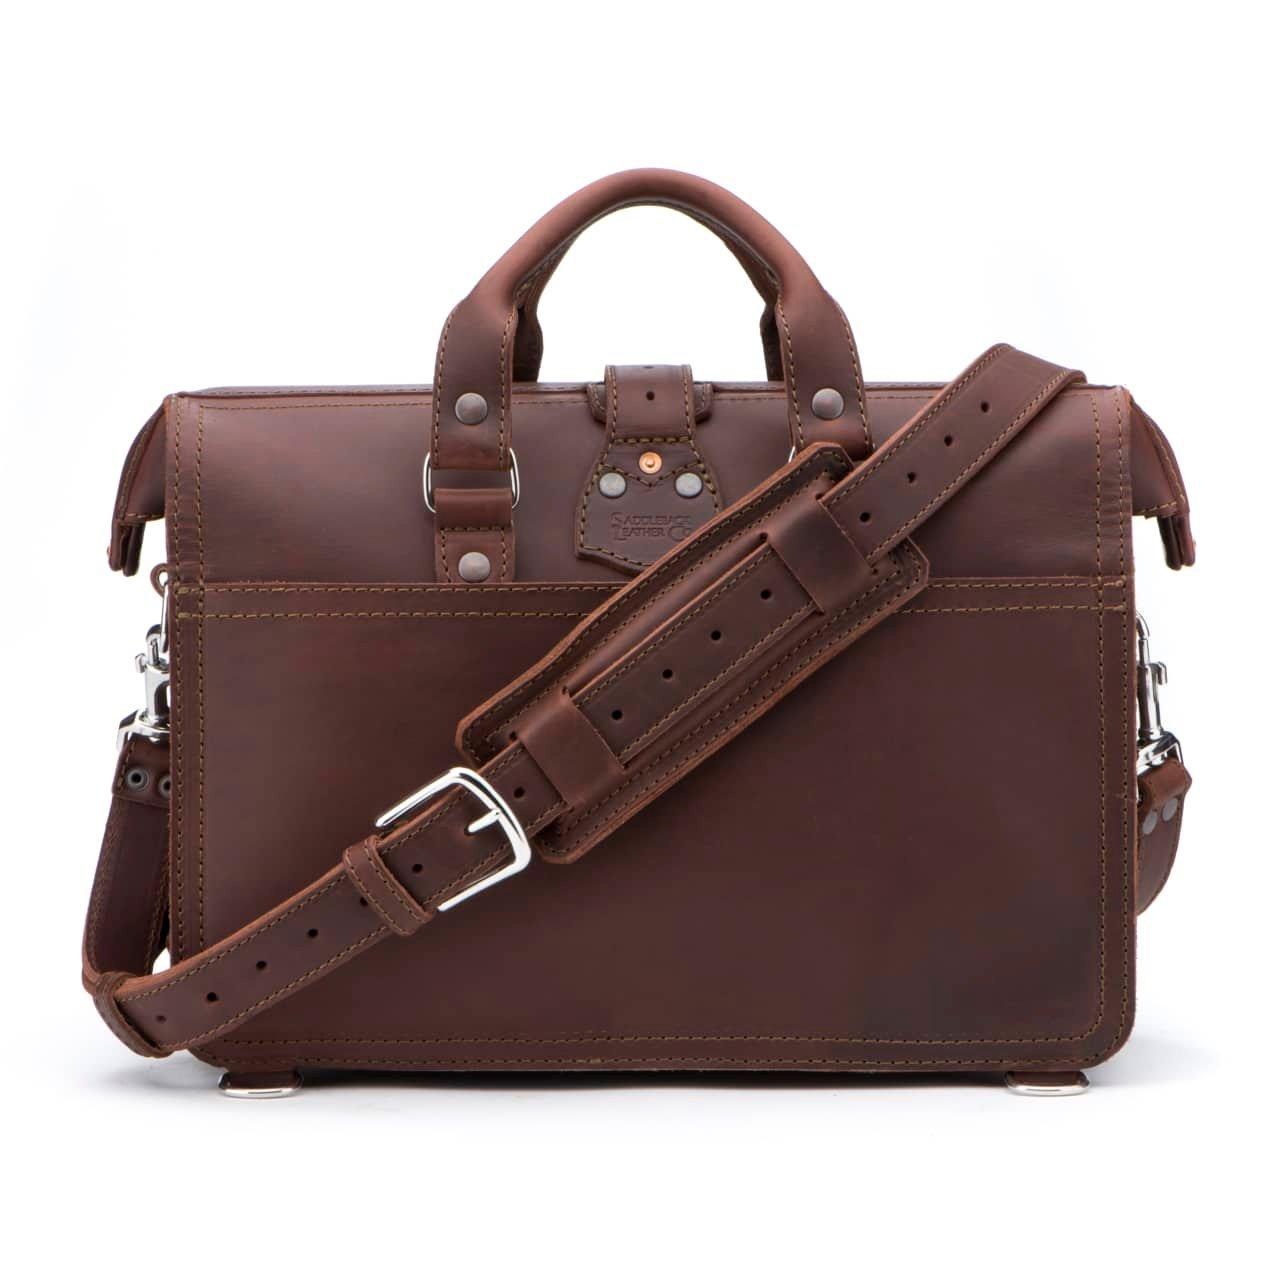 Saddleback Leather Co. Flight Bag 15-inch Full Grain Leather Expandable Laptop Briefcase for Men Includes 100 Year Warranty by Saddleback Leather Co. (Image #3)